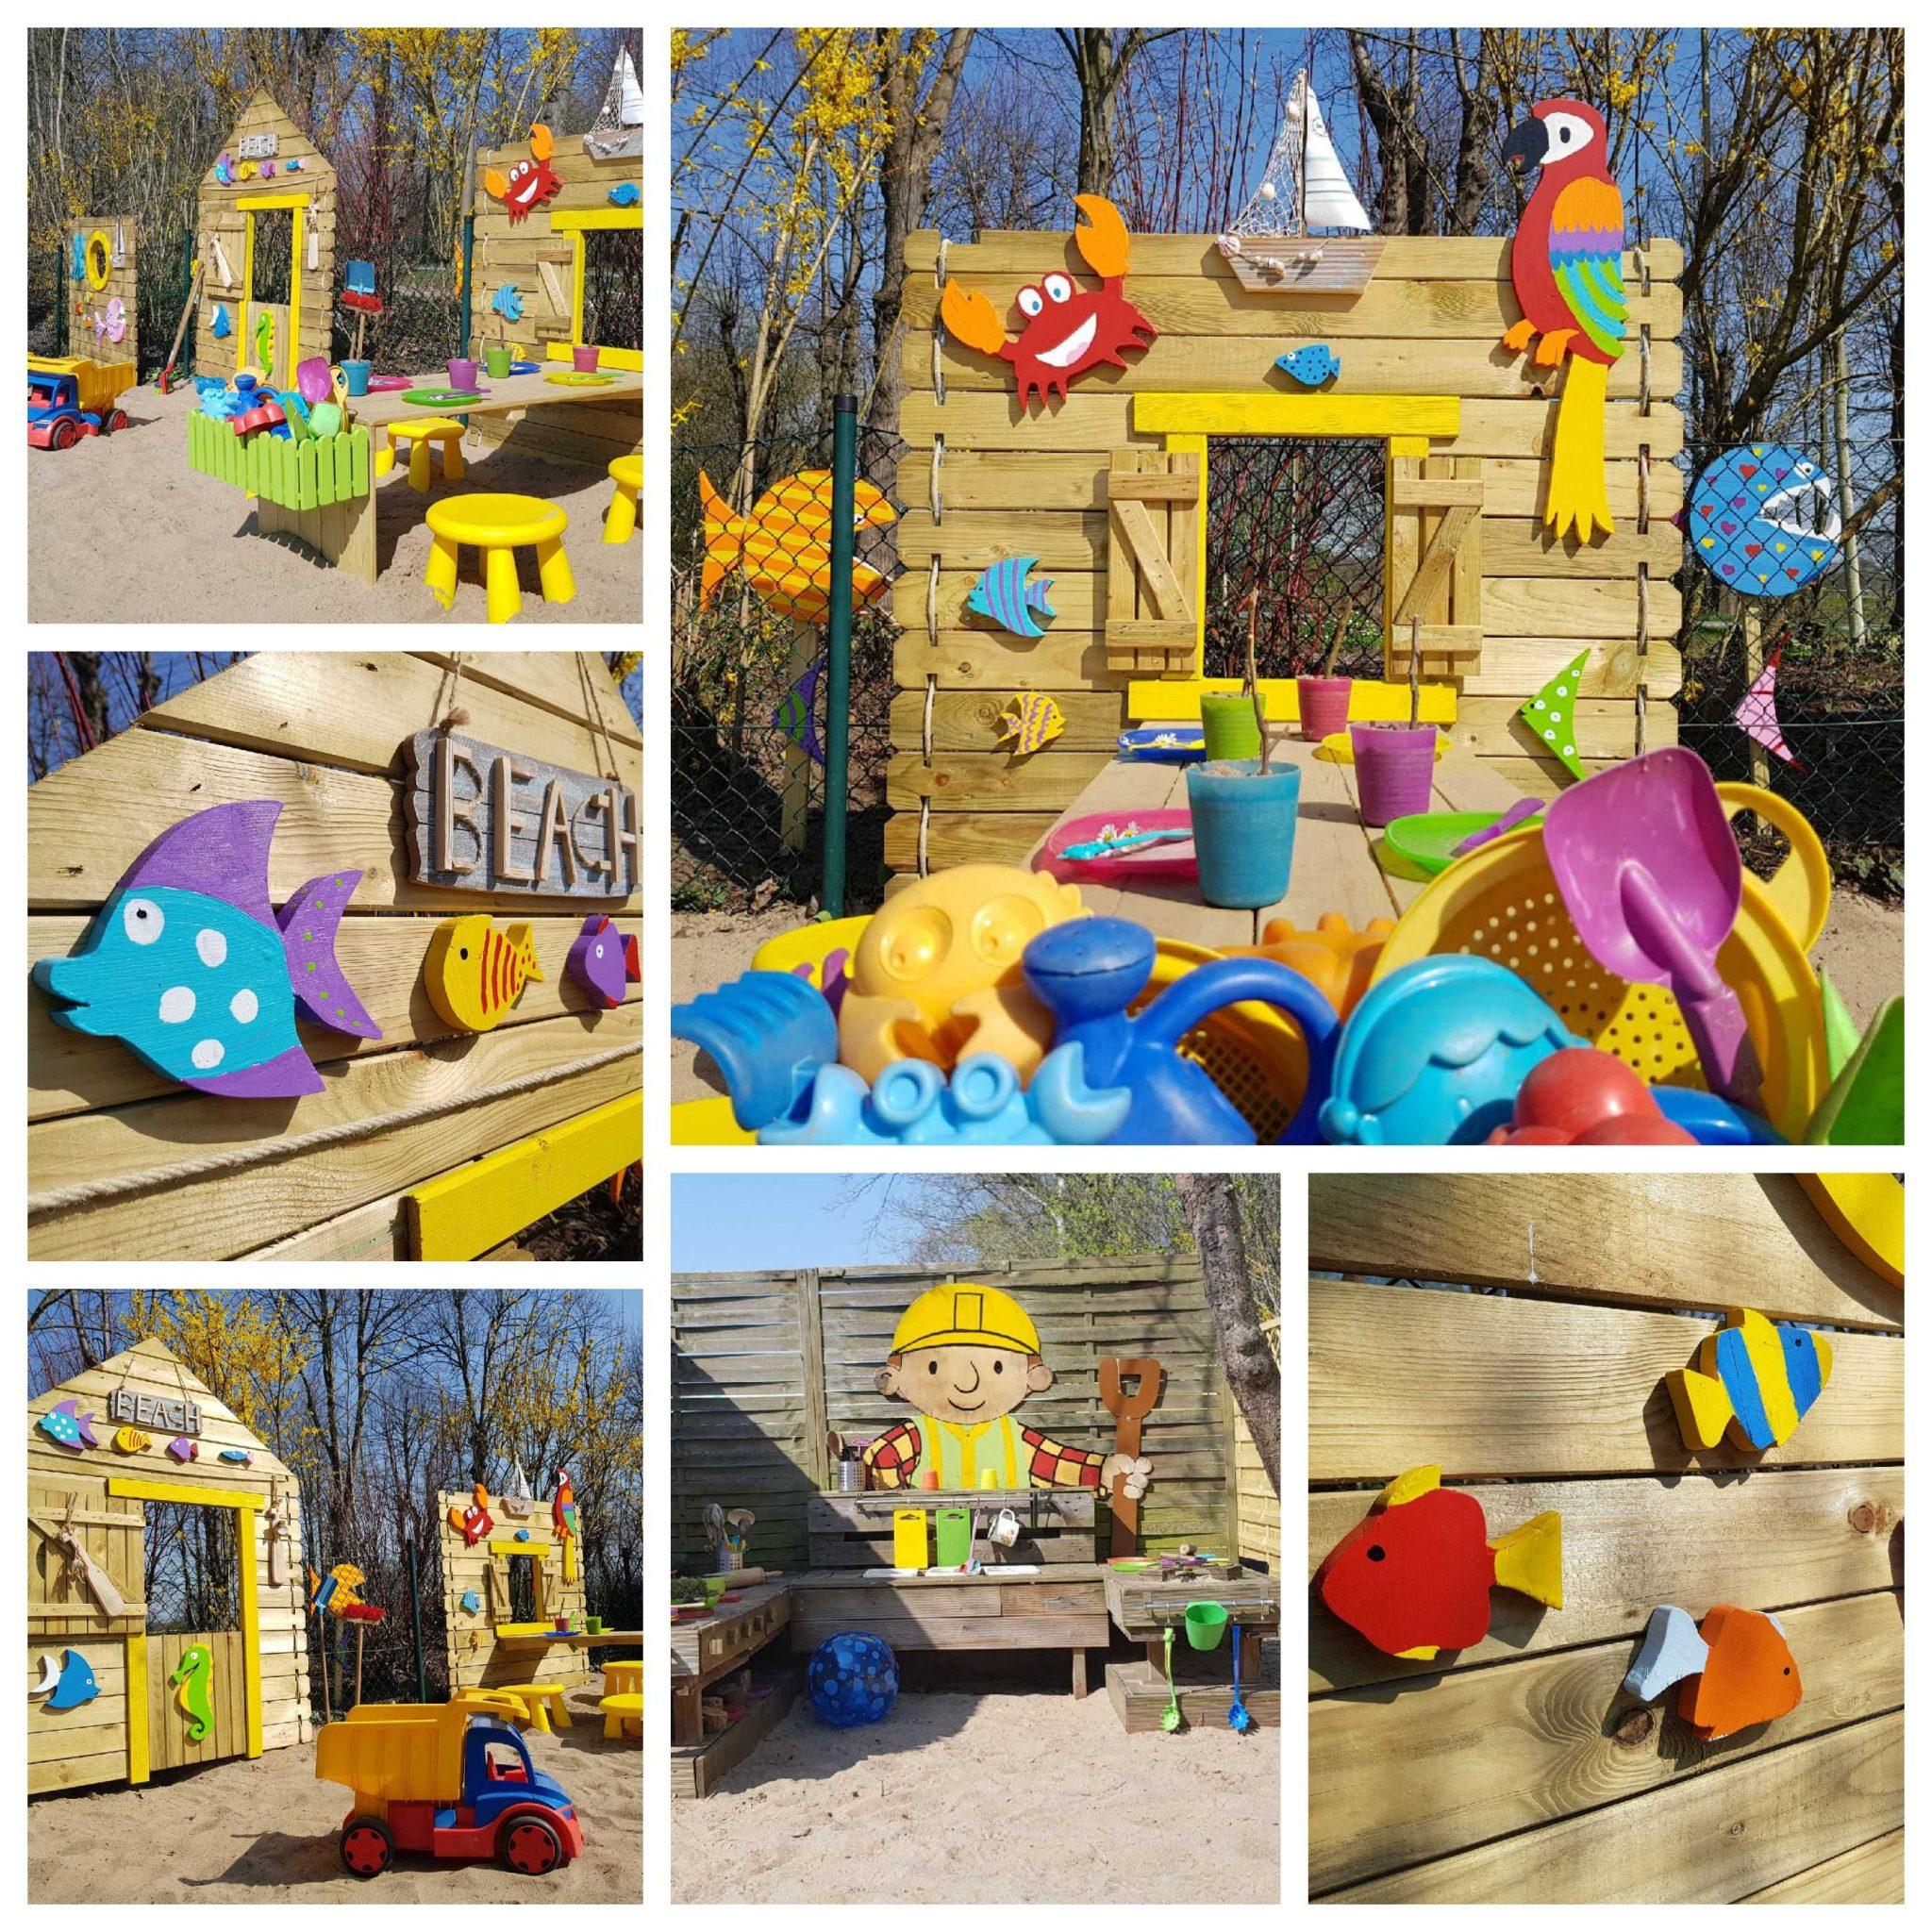 Kid Zone Erlebnisgarten mit Kinderbeachclub